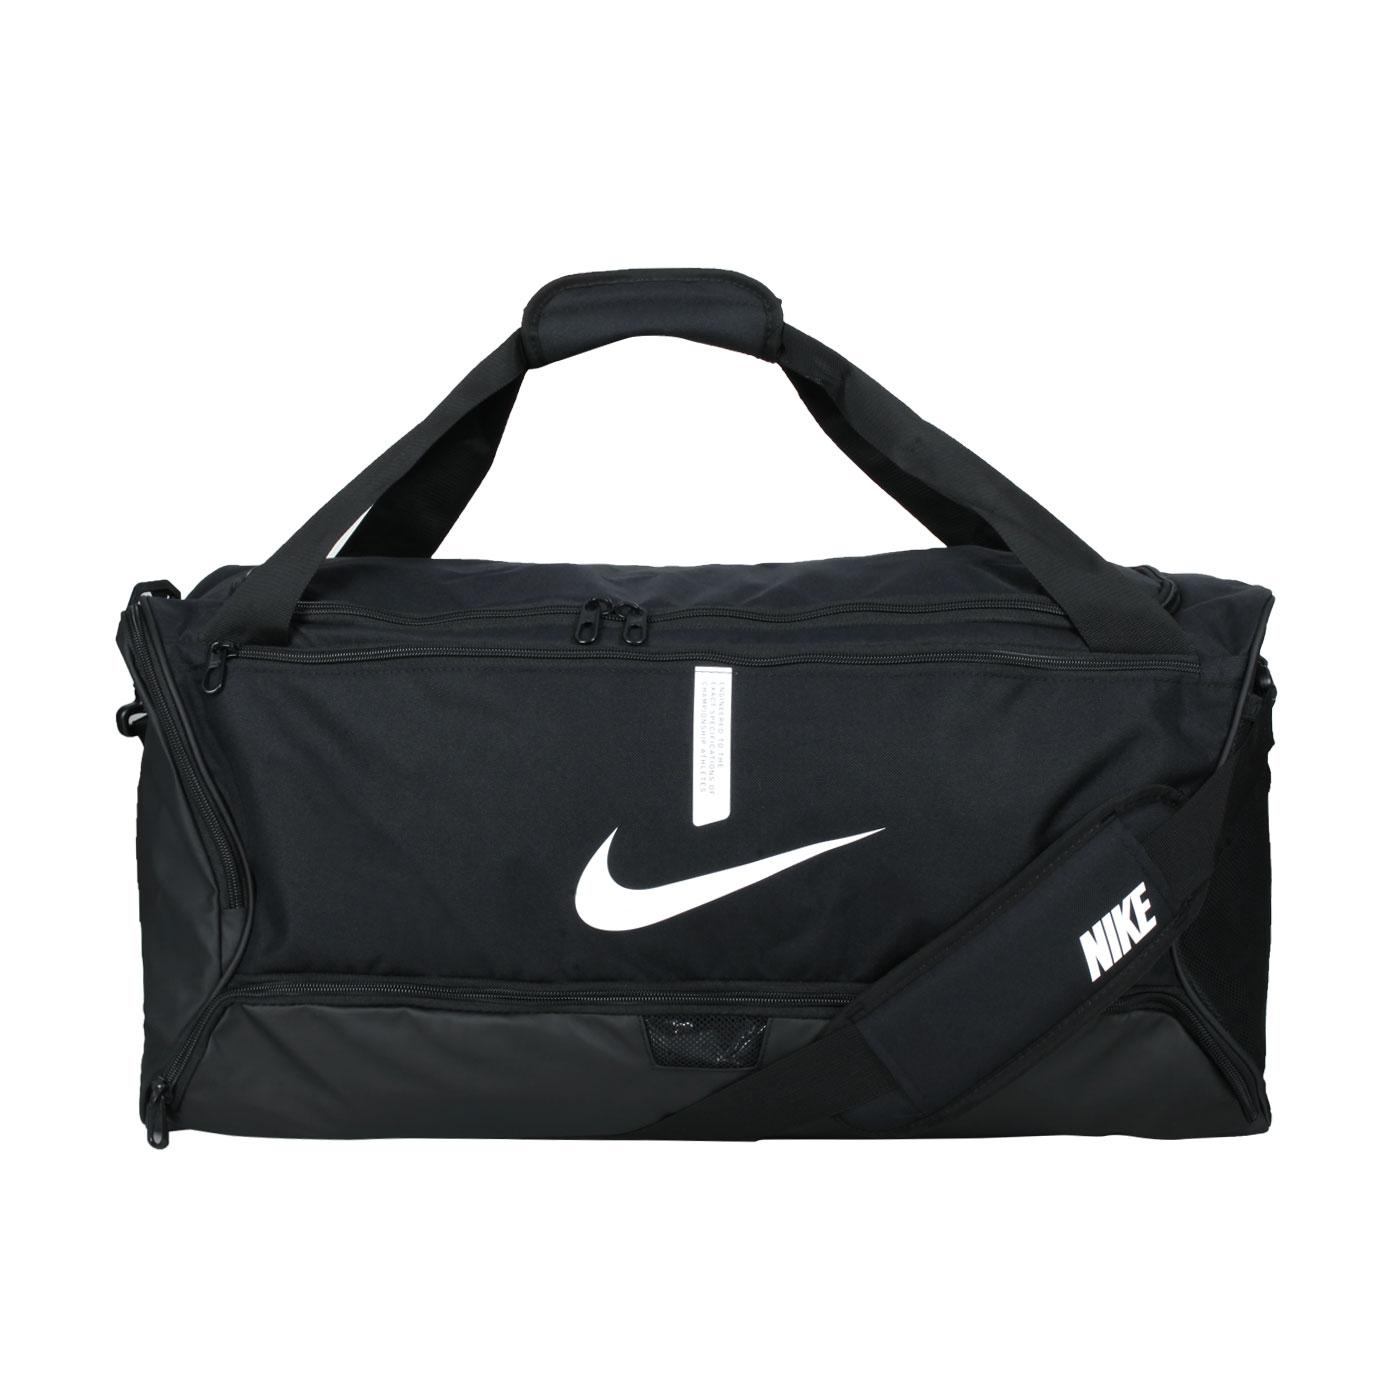 NIKE 手提旅行袋 CU8090-010 - 黑白